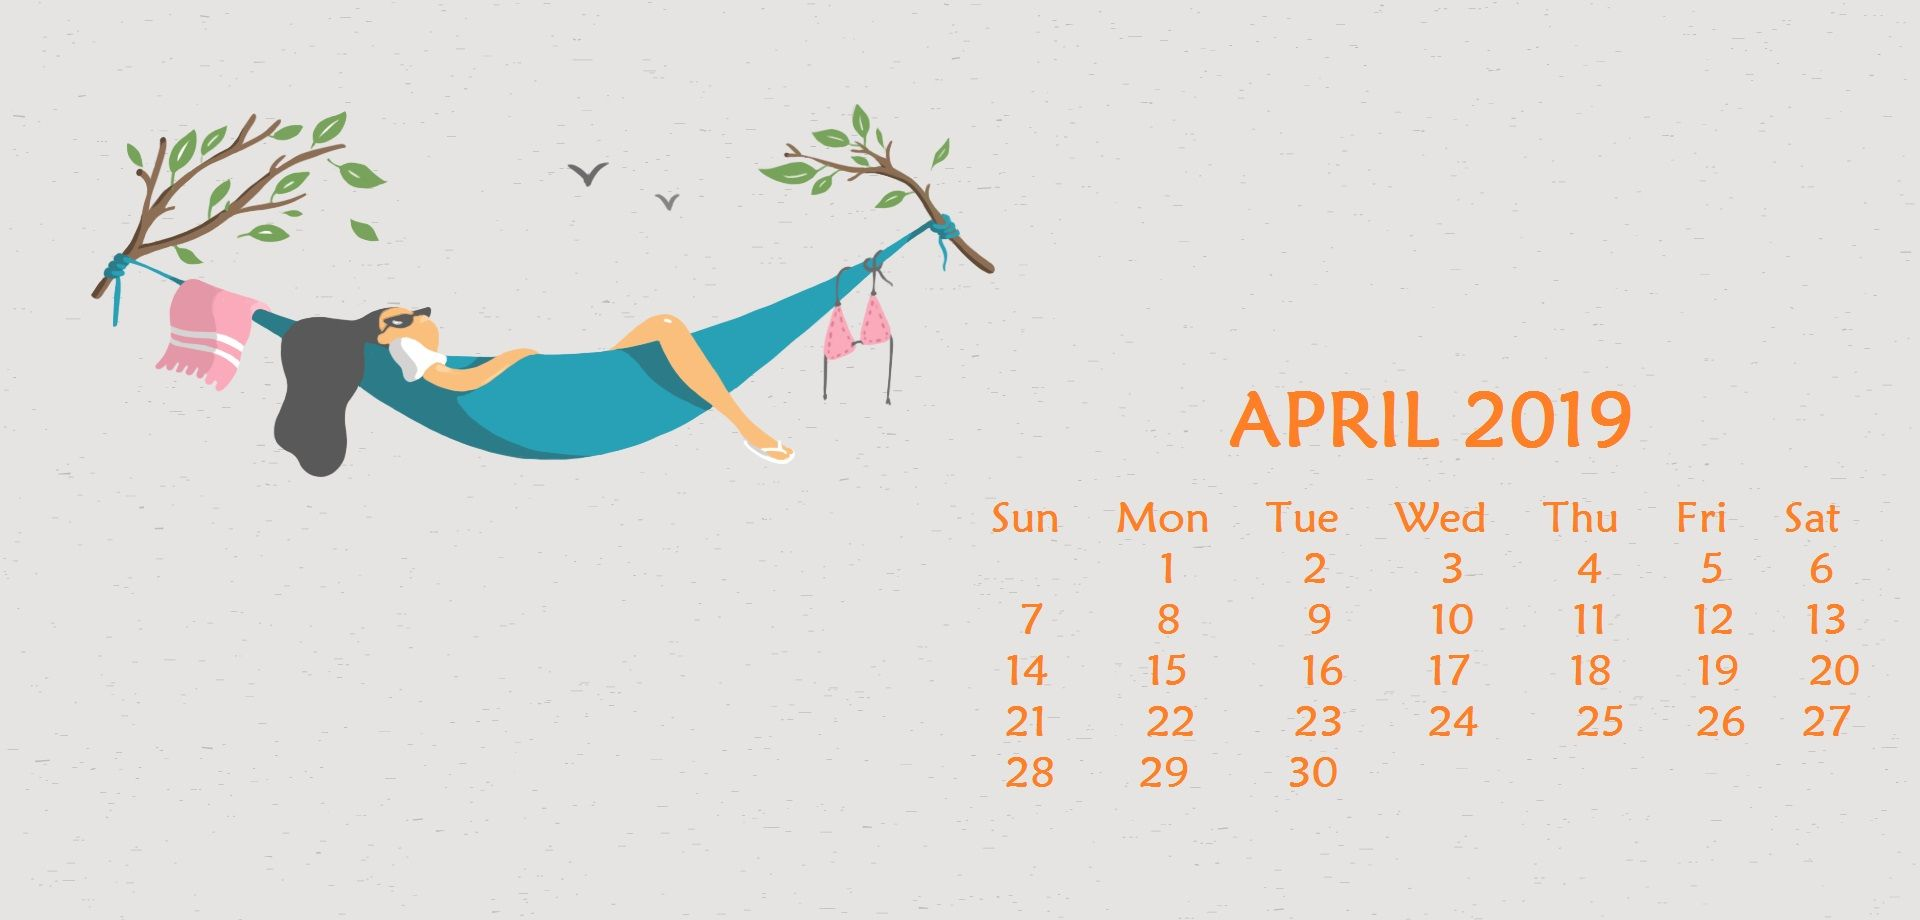 April 2020 Desktop Calendar Wallpaper Calendar Wallpaper